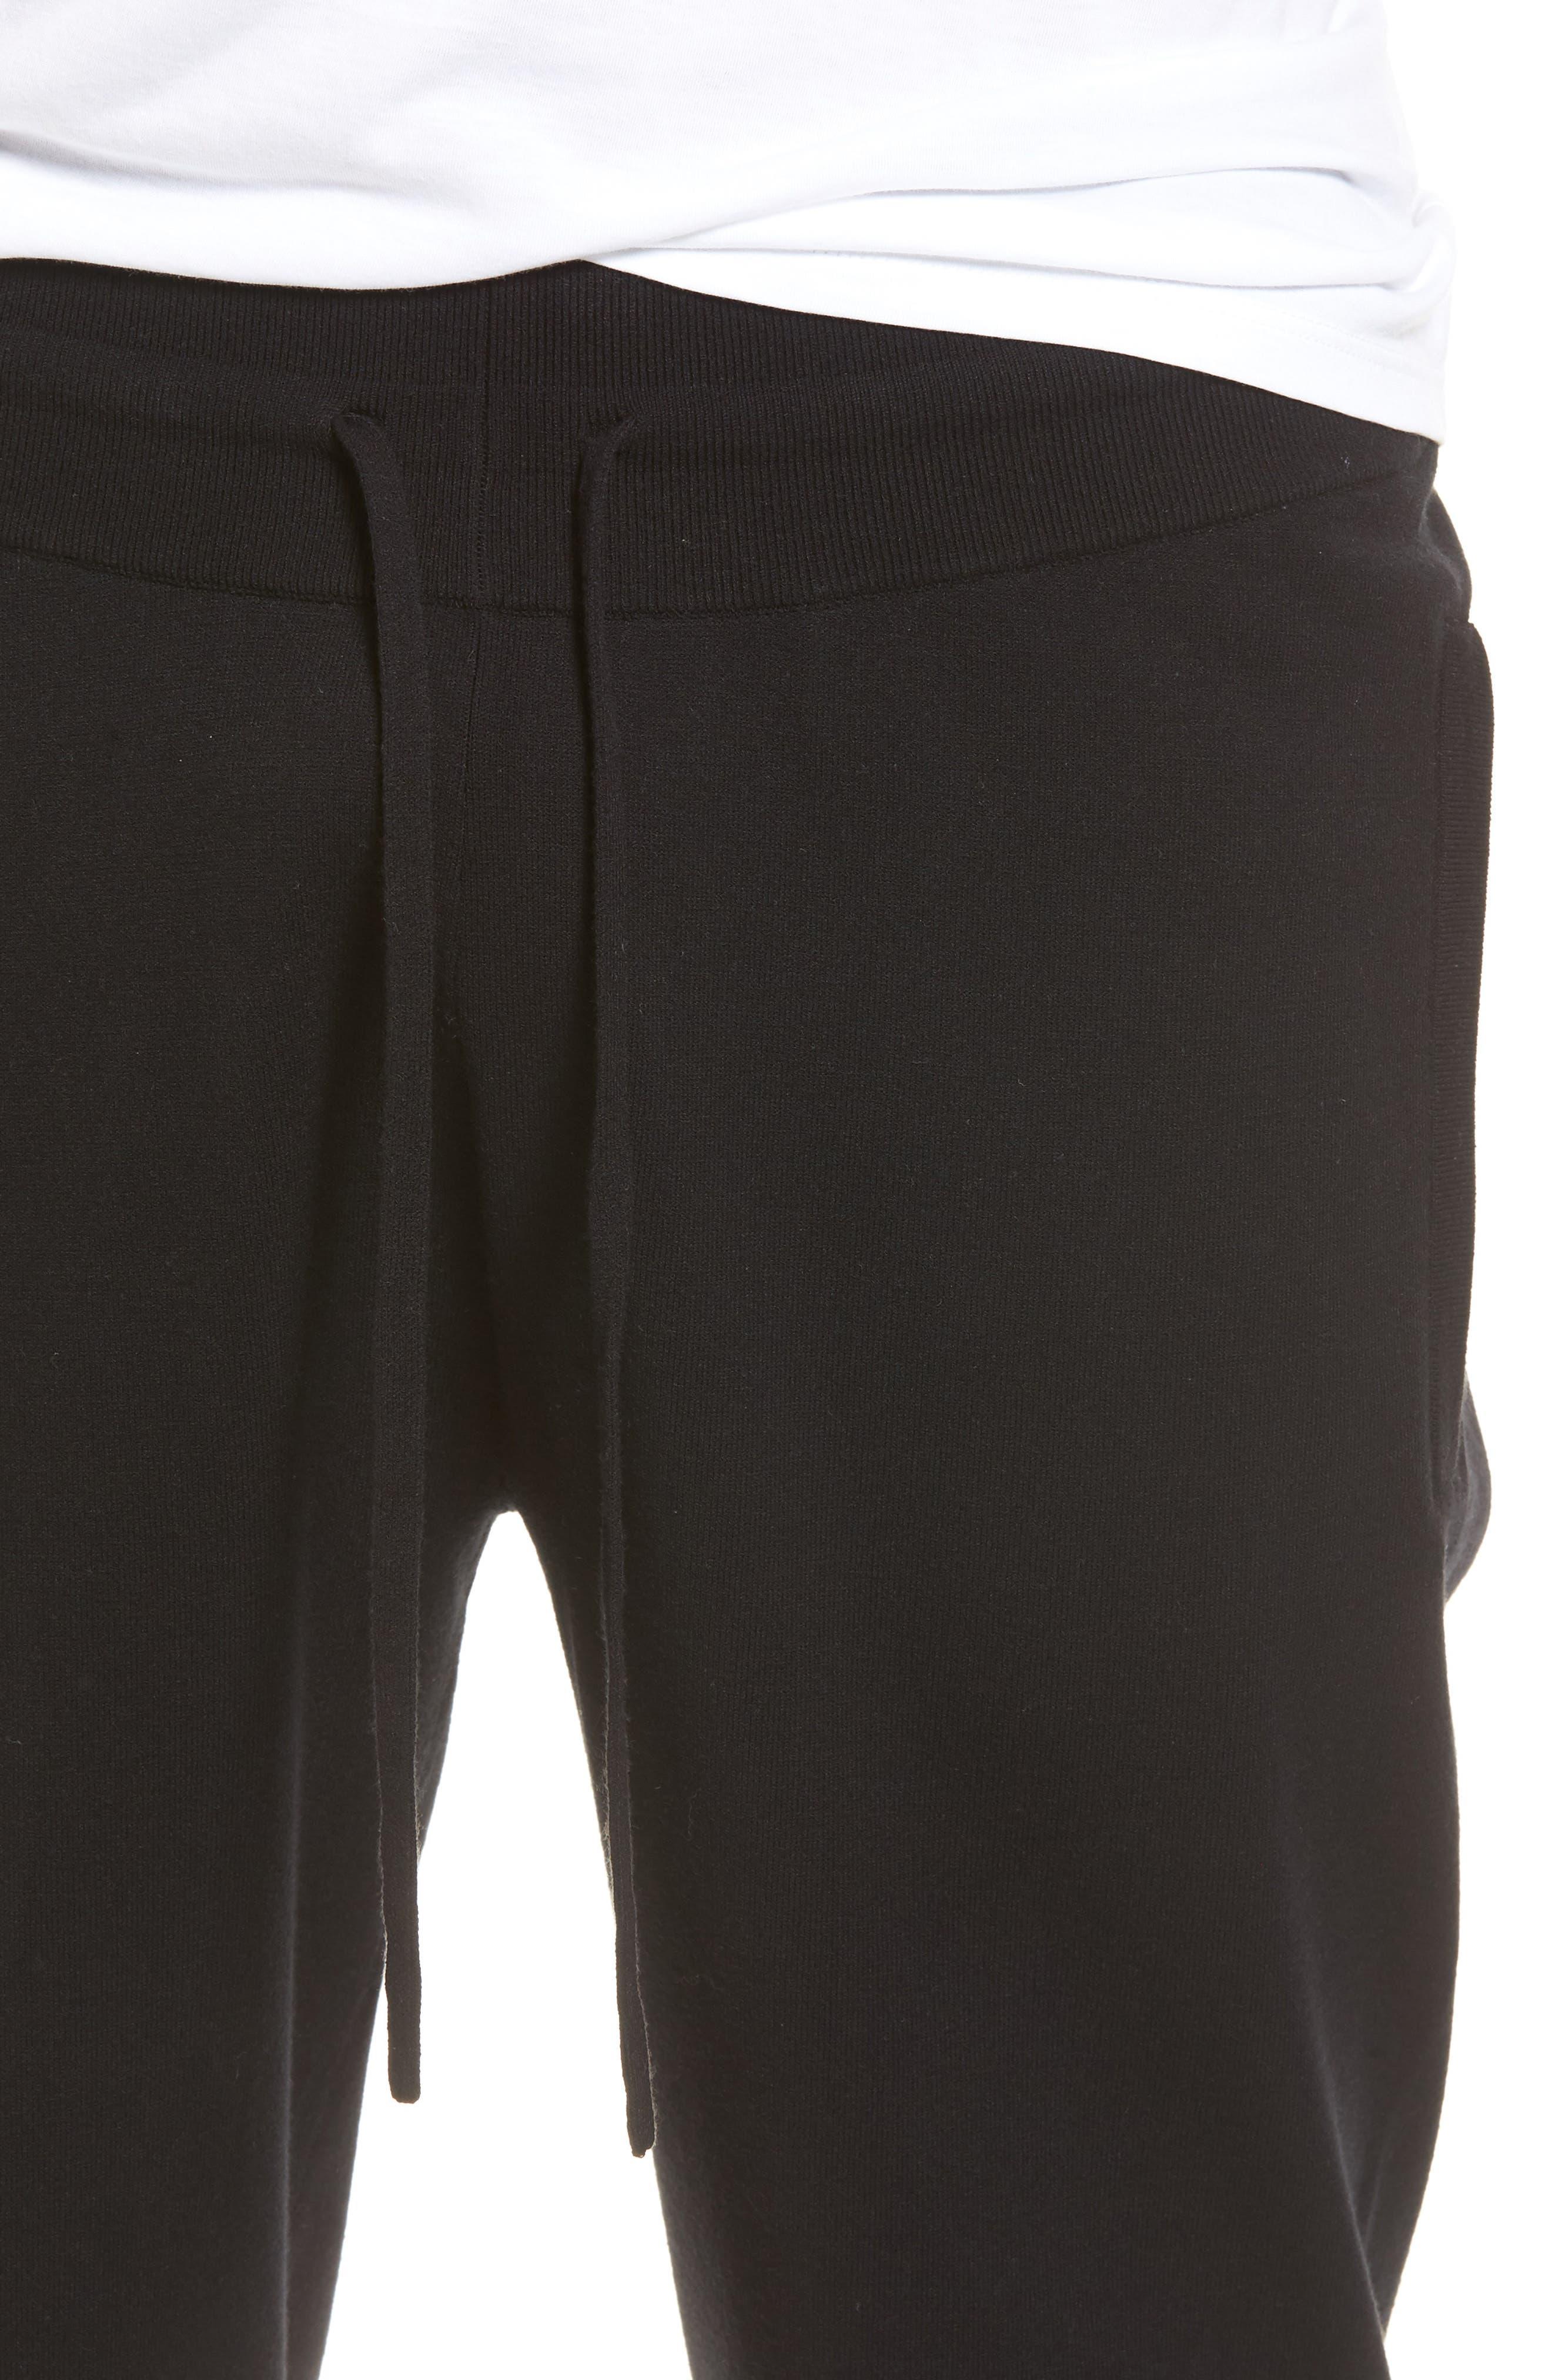 Slim Fit Jogger Pants,                             Alternate thumbnail 4, color,                             Black